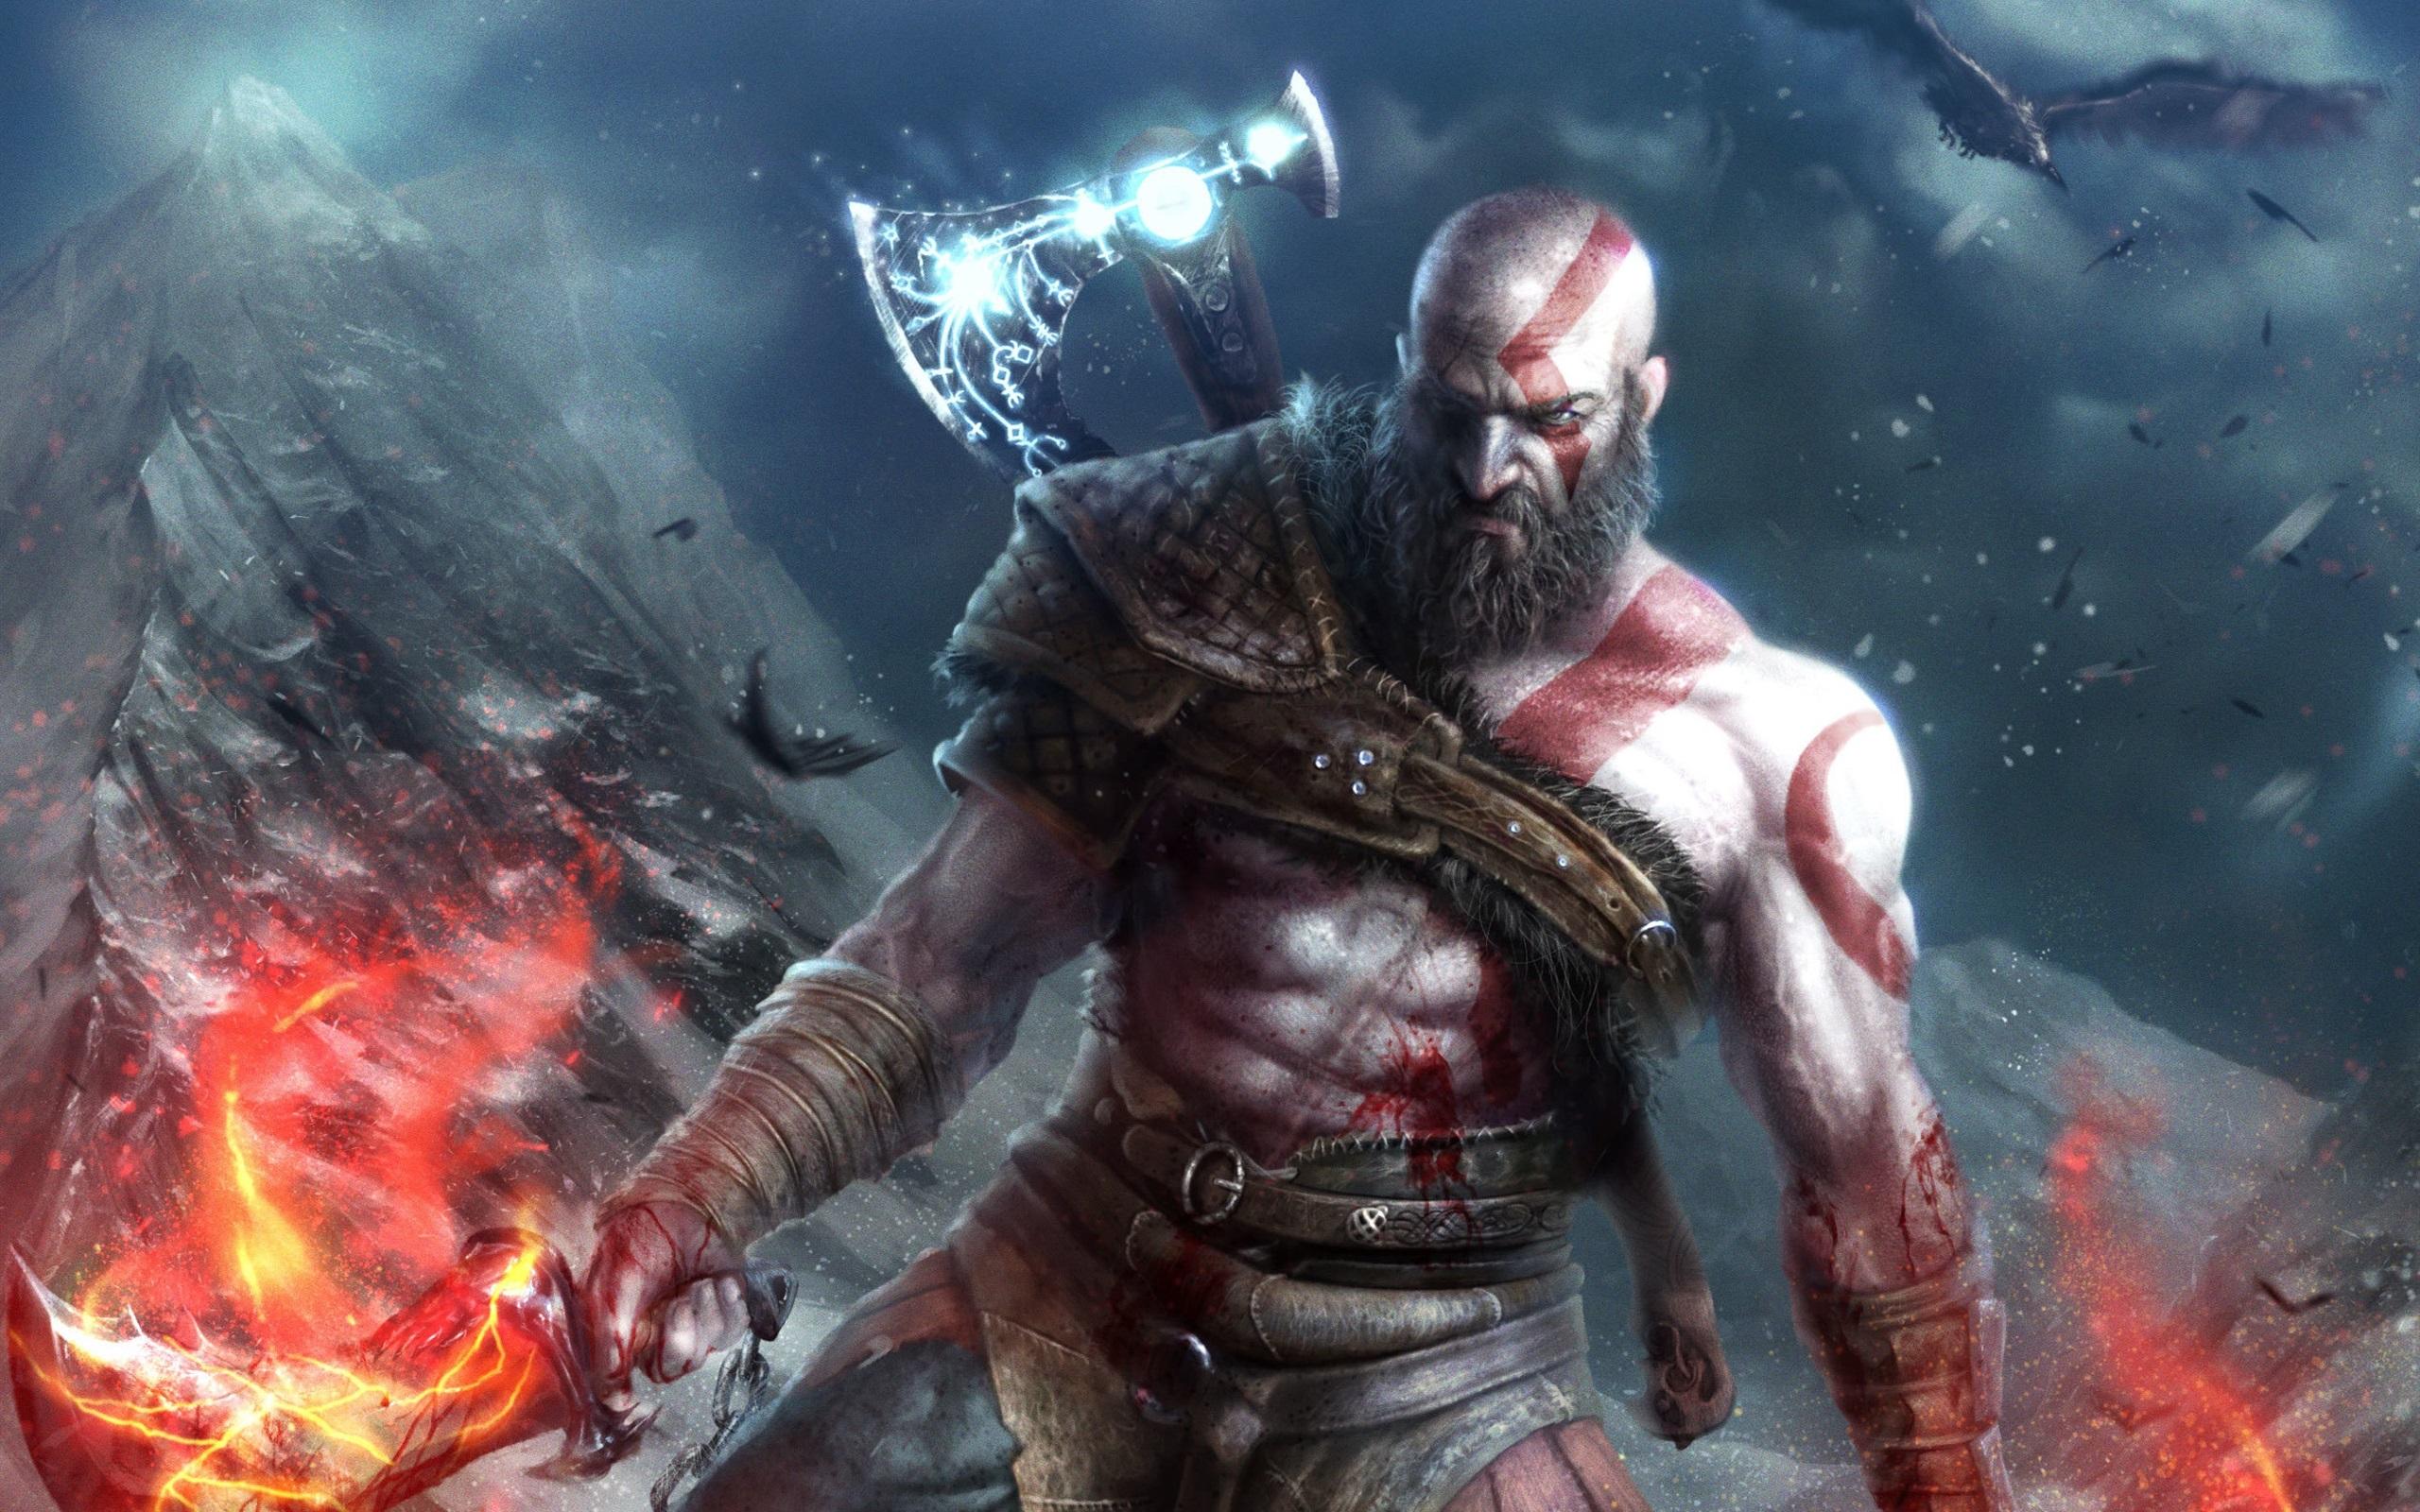 Wallpaper god of war 4 video games 2560x1600 hd picture - God of war wallpaper for ps4 ...